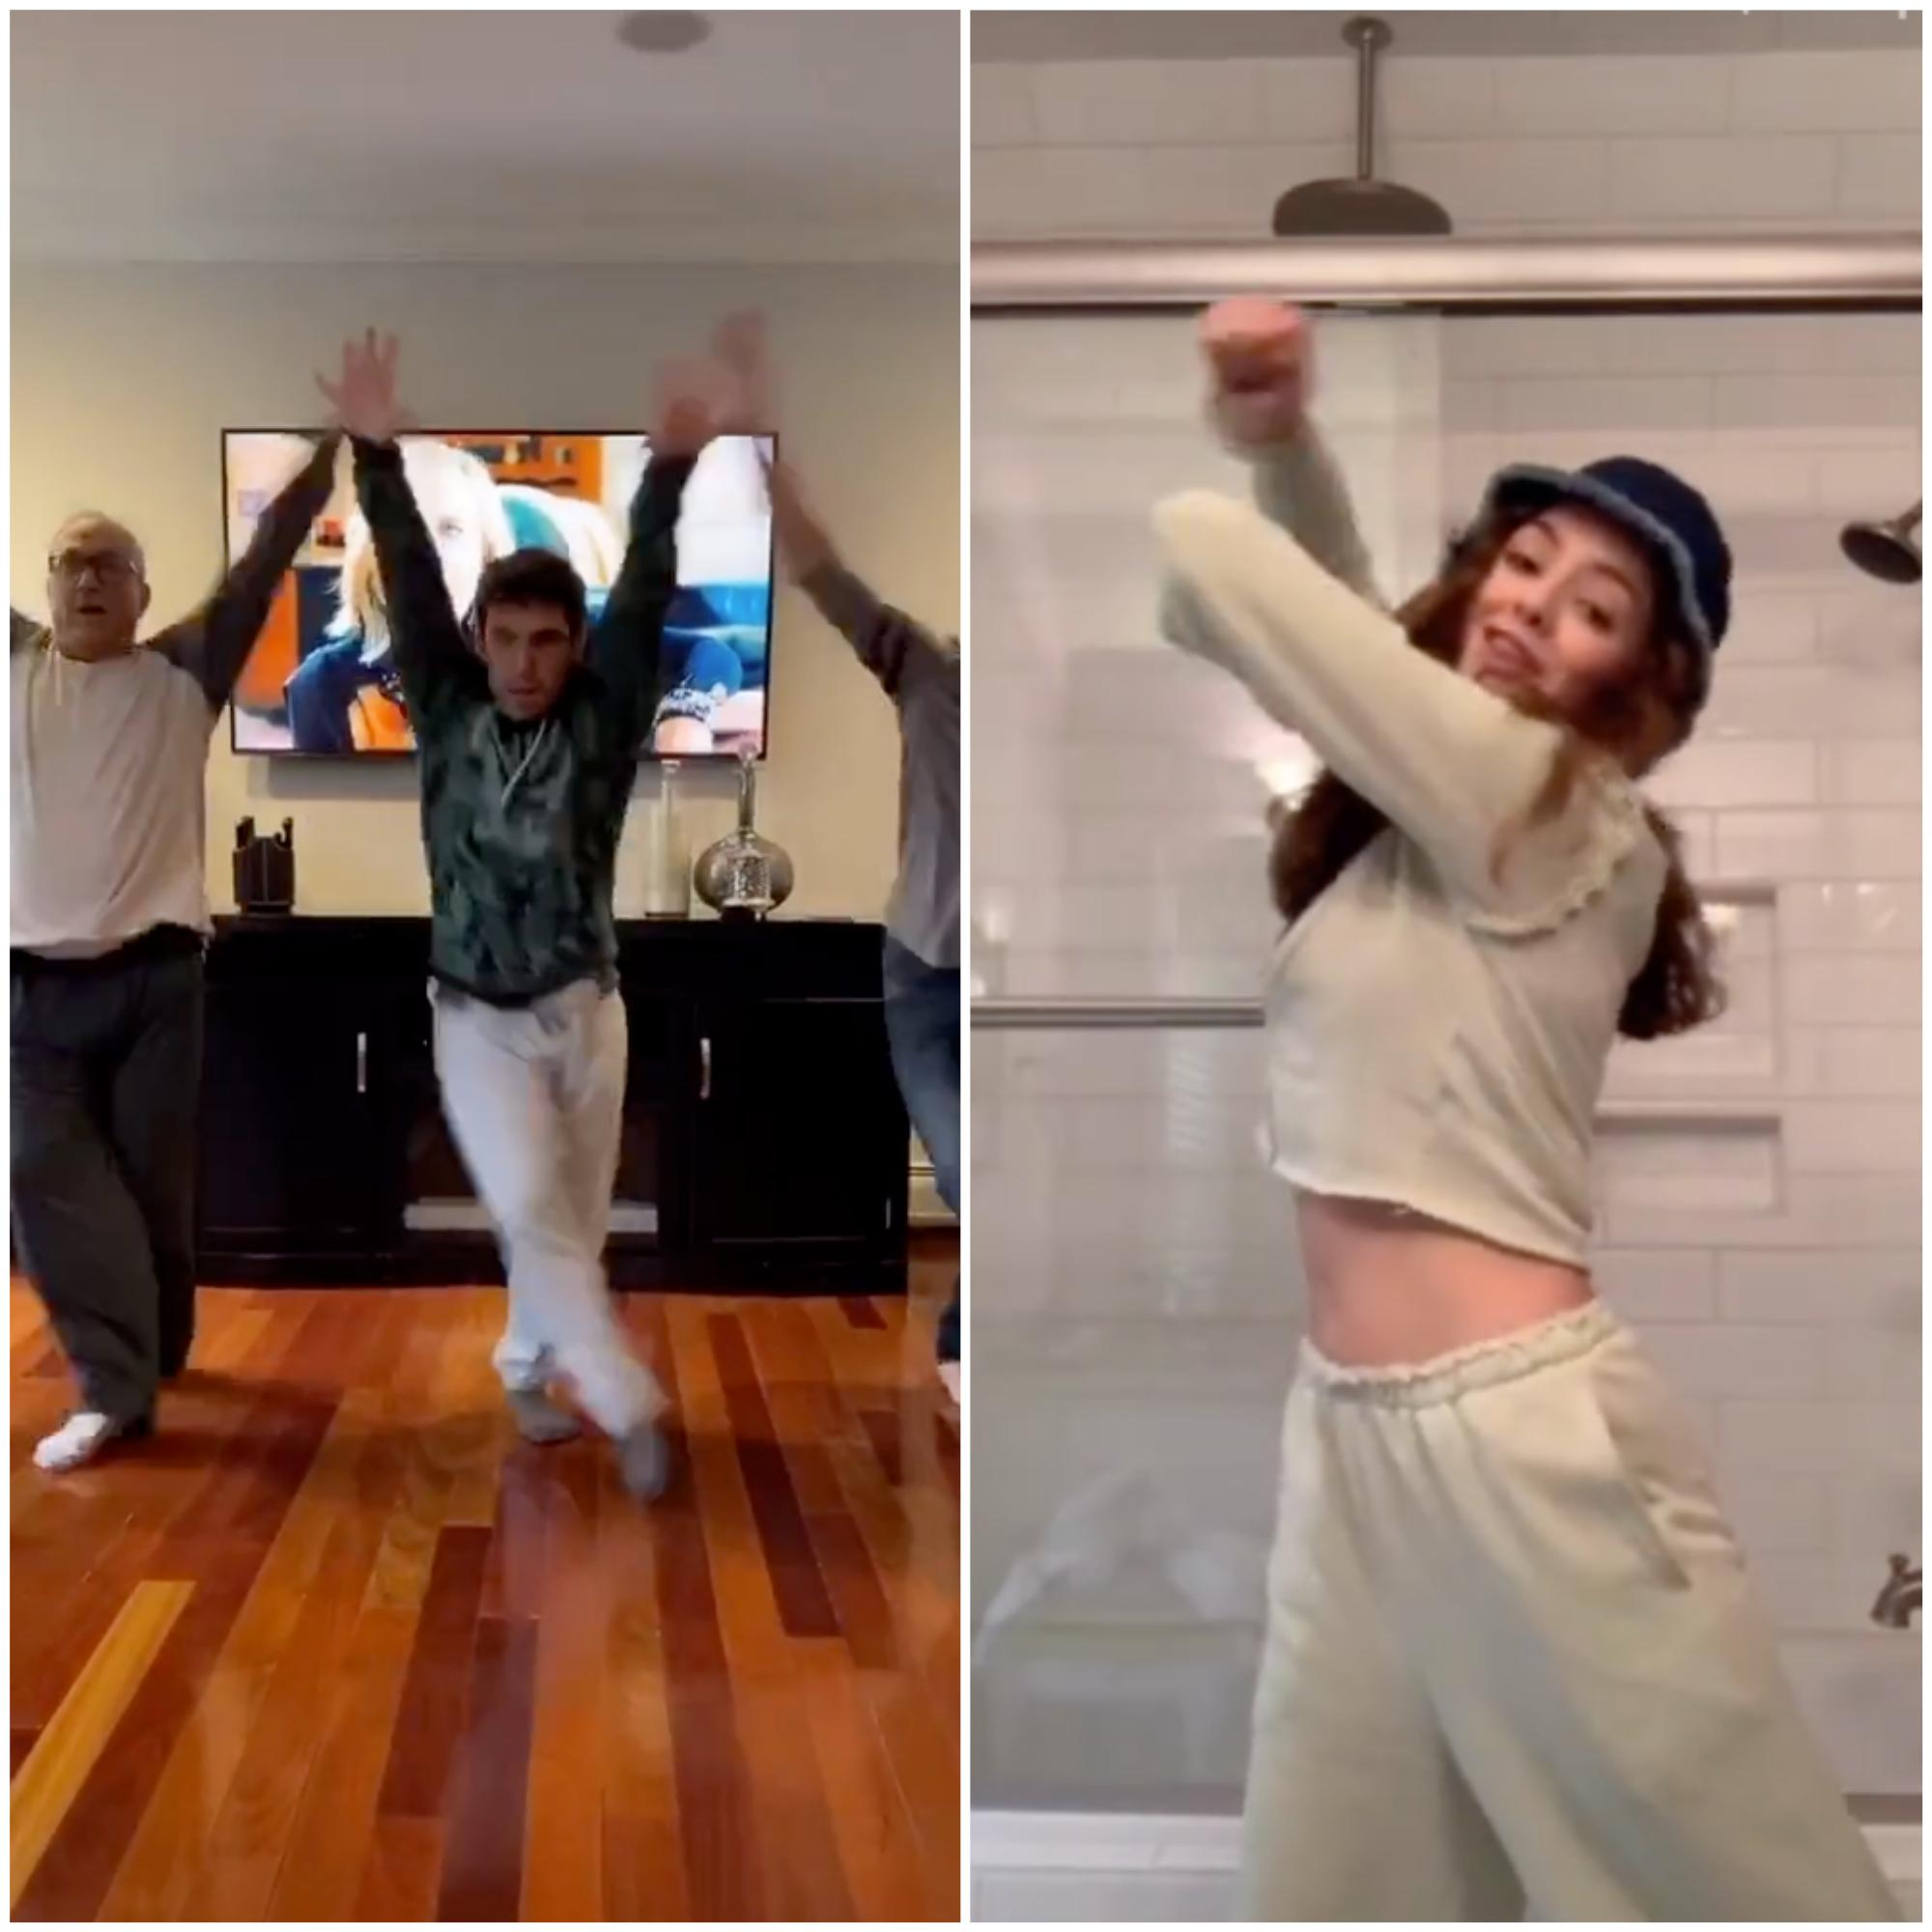 Viral Tiktok Dances 5 Easy Tiktok Dances Anyone Can Learn